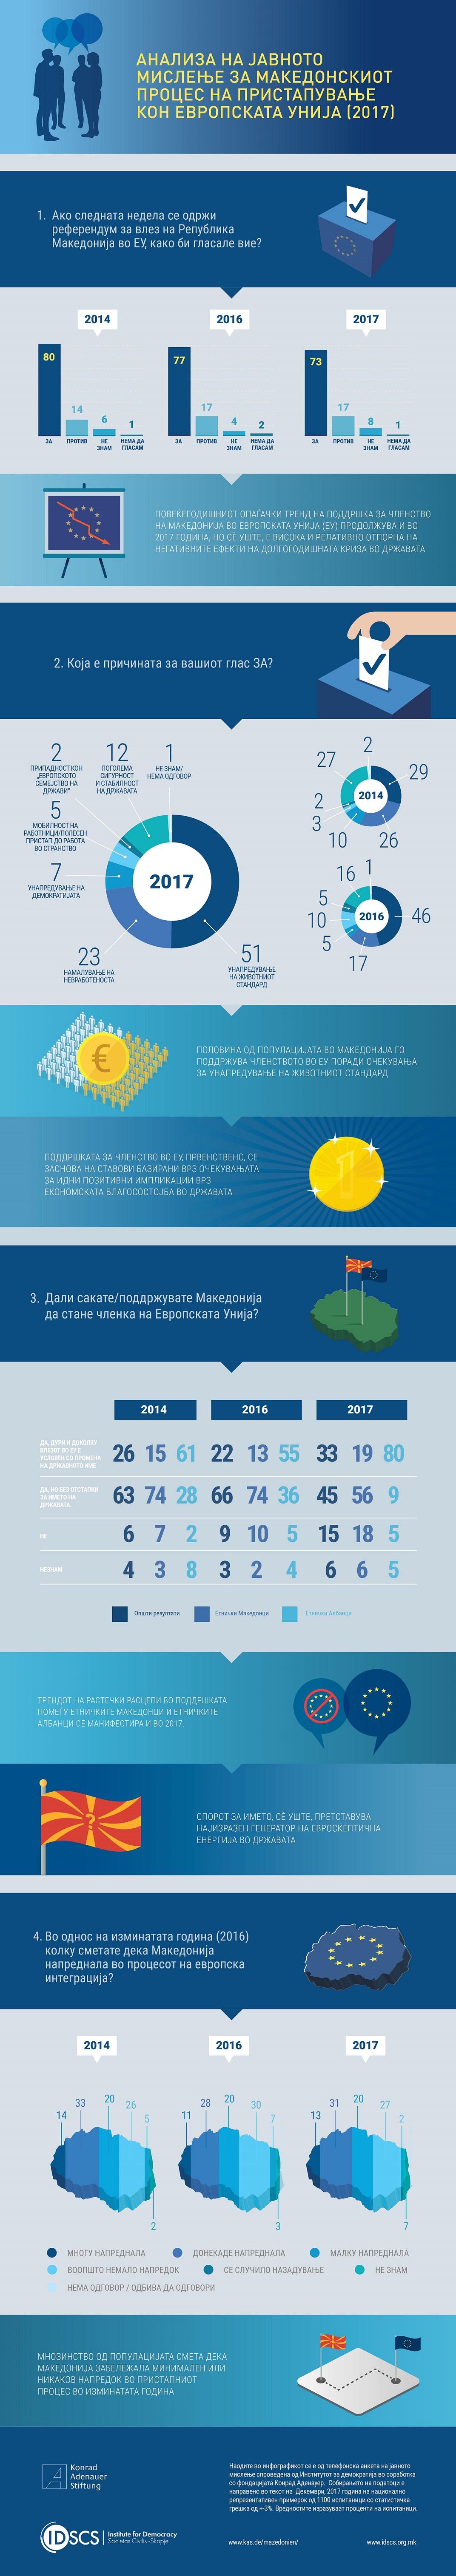 Infografik-javno-mislenje-pristapuvanje-EU-2017